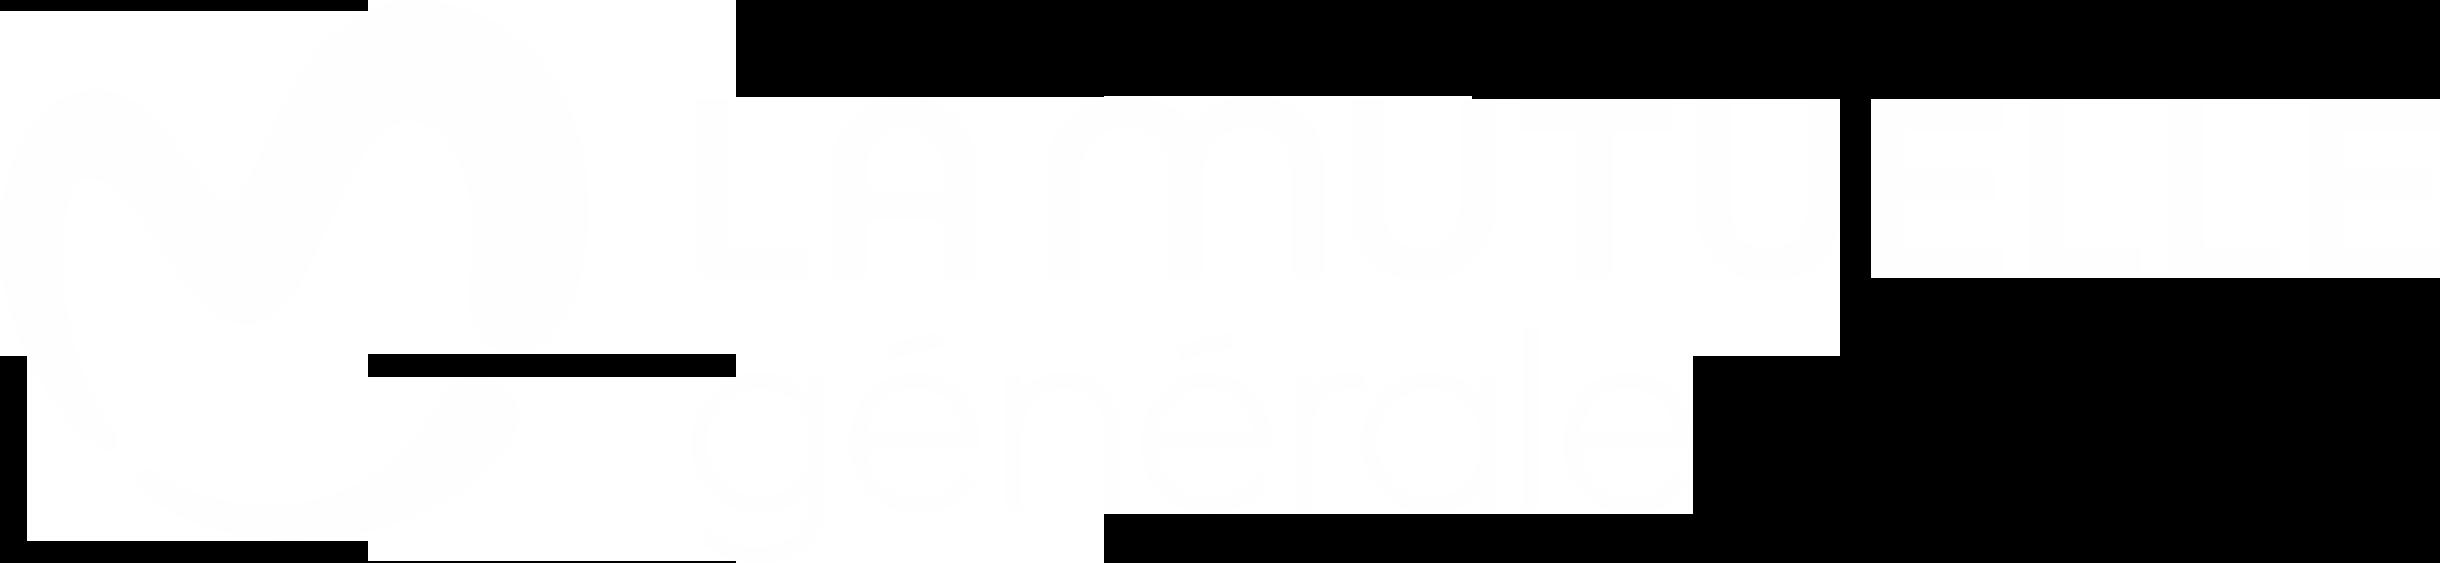 lamutuelle-generale-logoBLANC